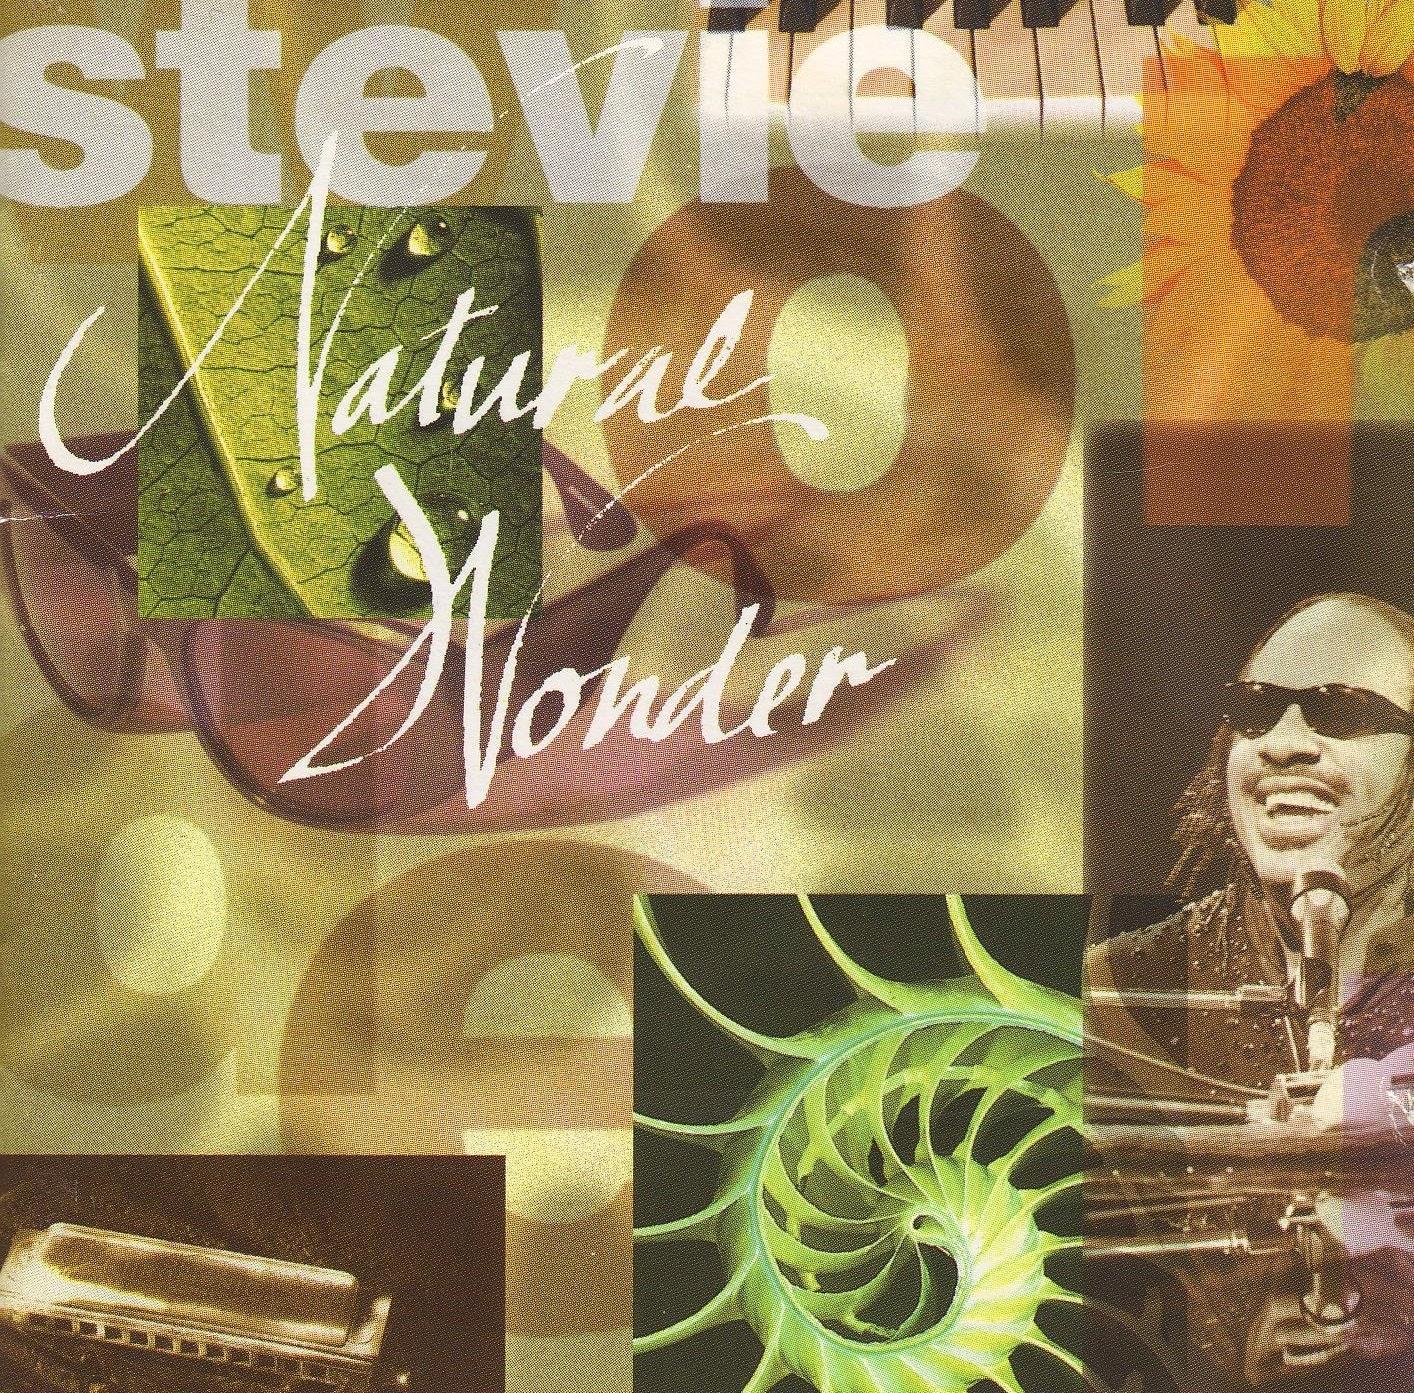 DD] Discografía Stevie Wonder Completa 320 kbps [MEGA]